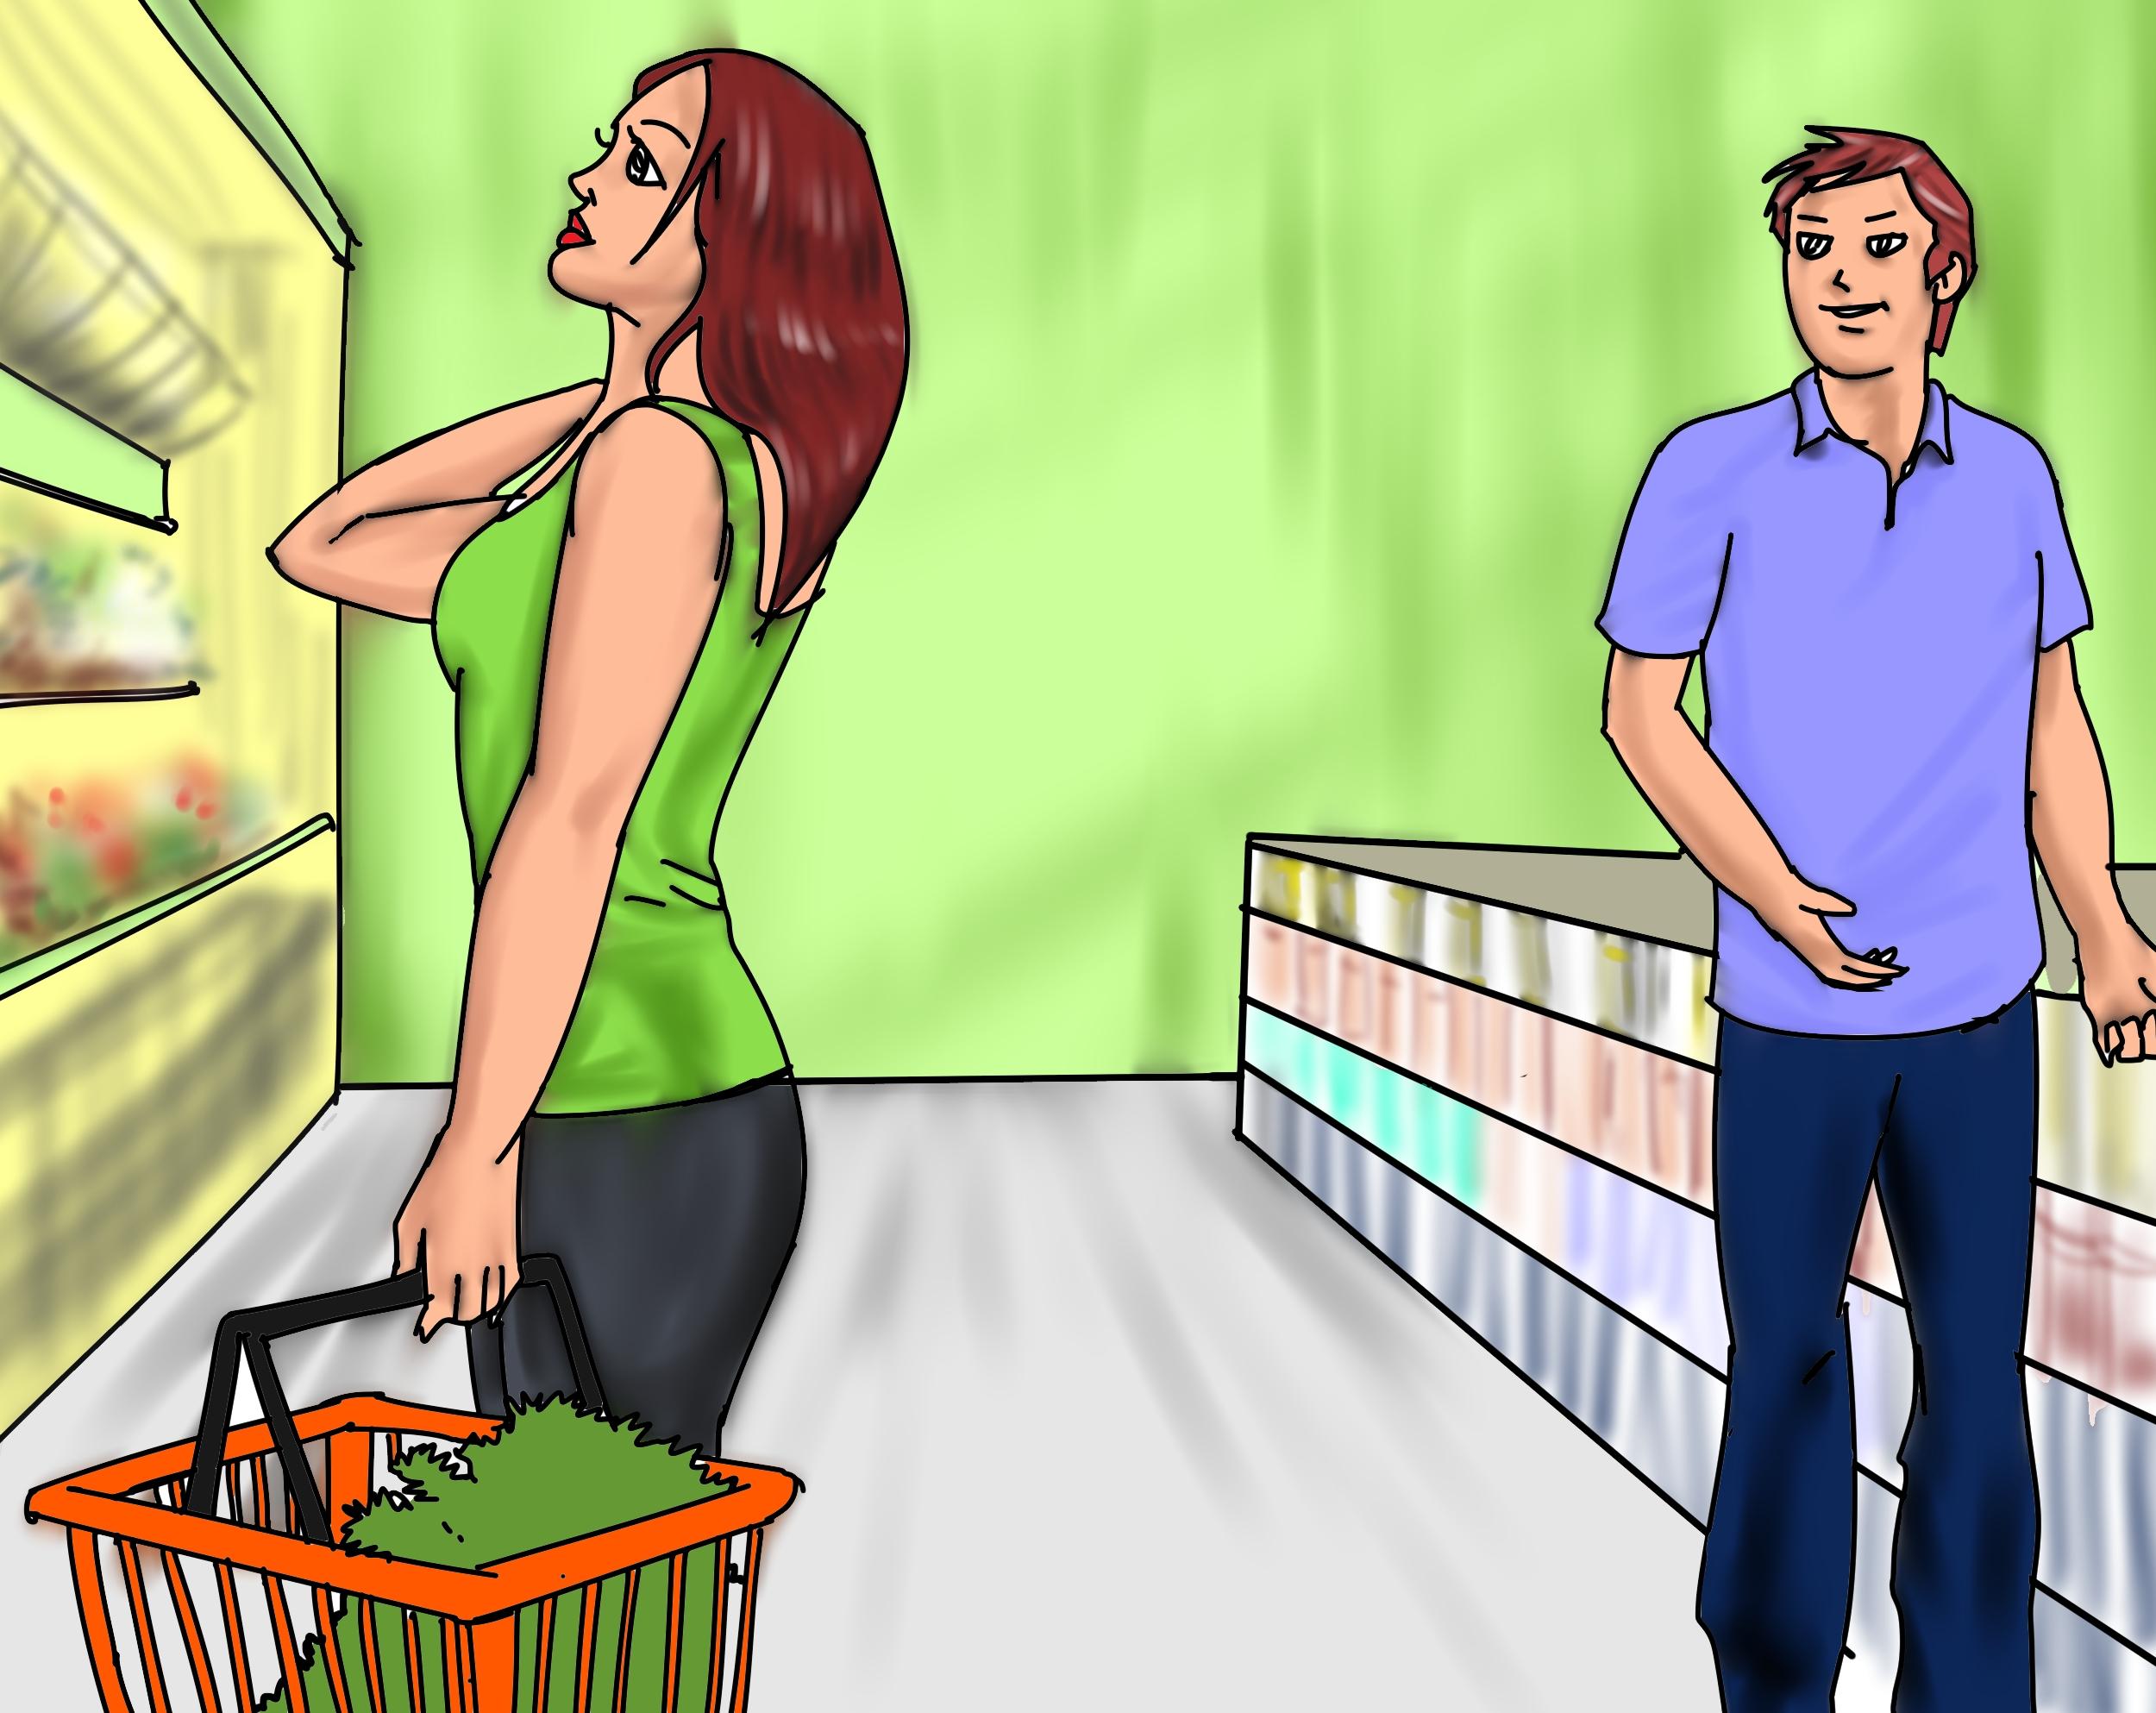 Guy noticing girl